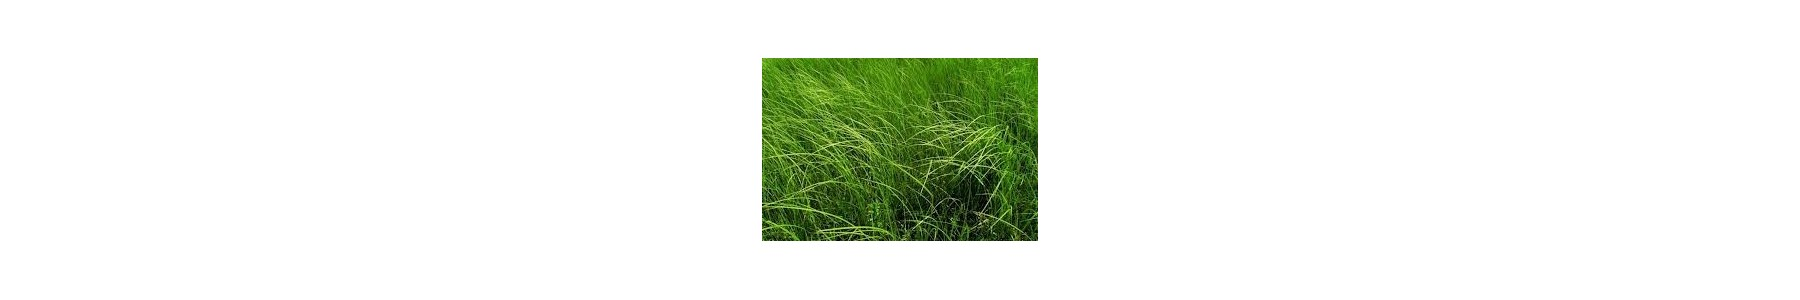 Nasiona traw - Trawa Barenbrug